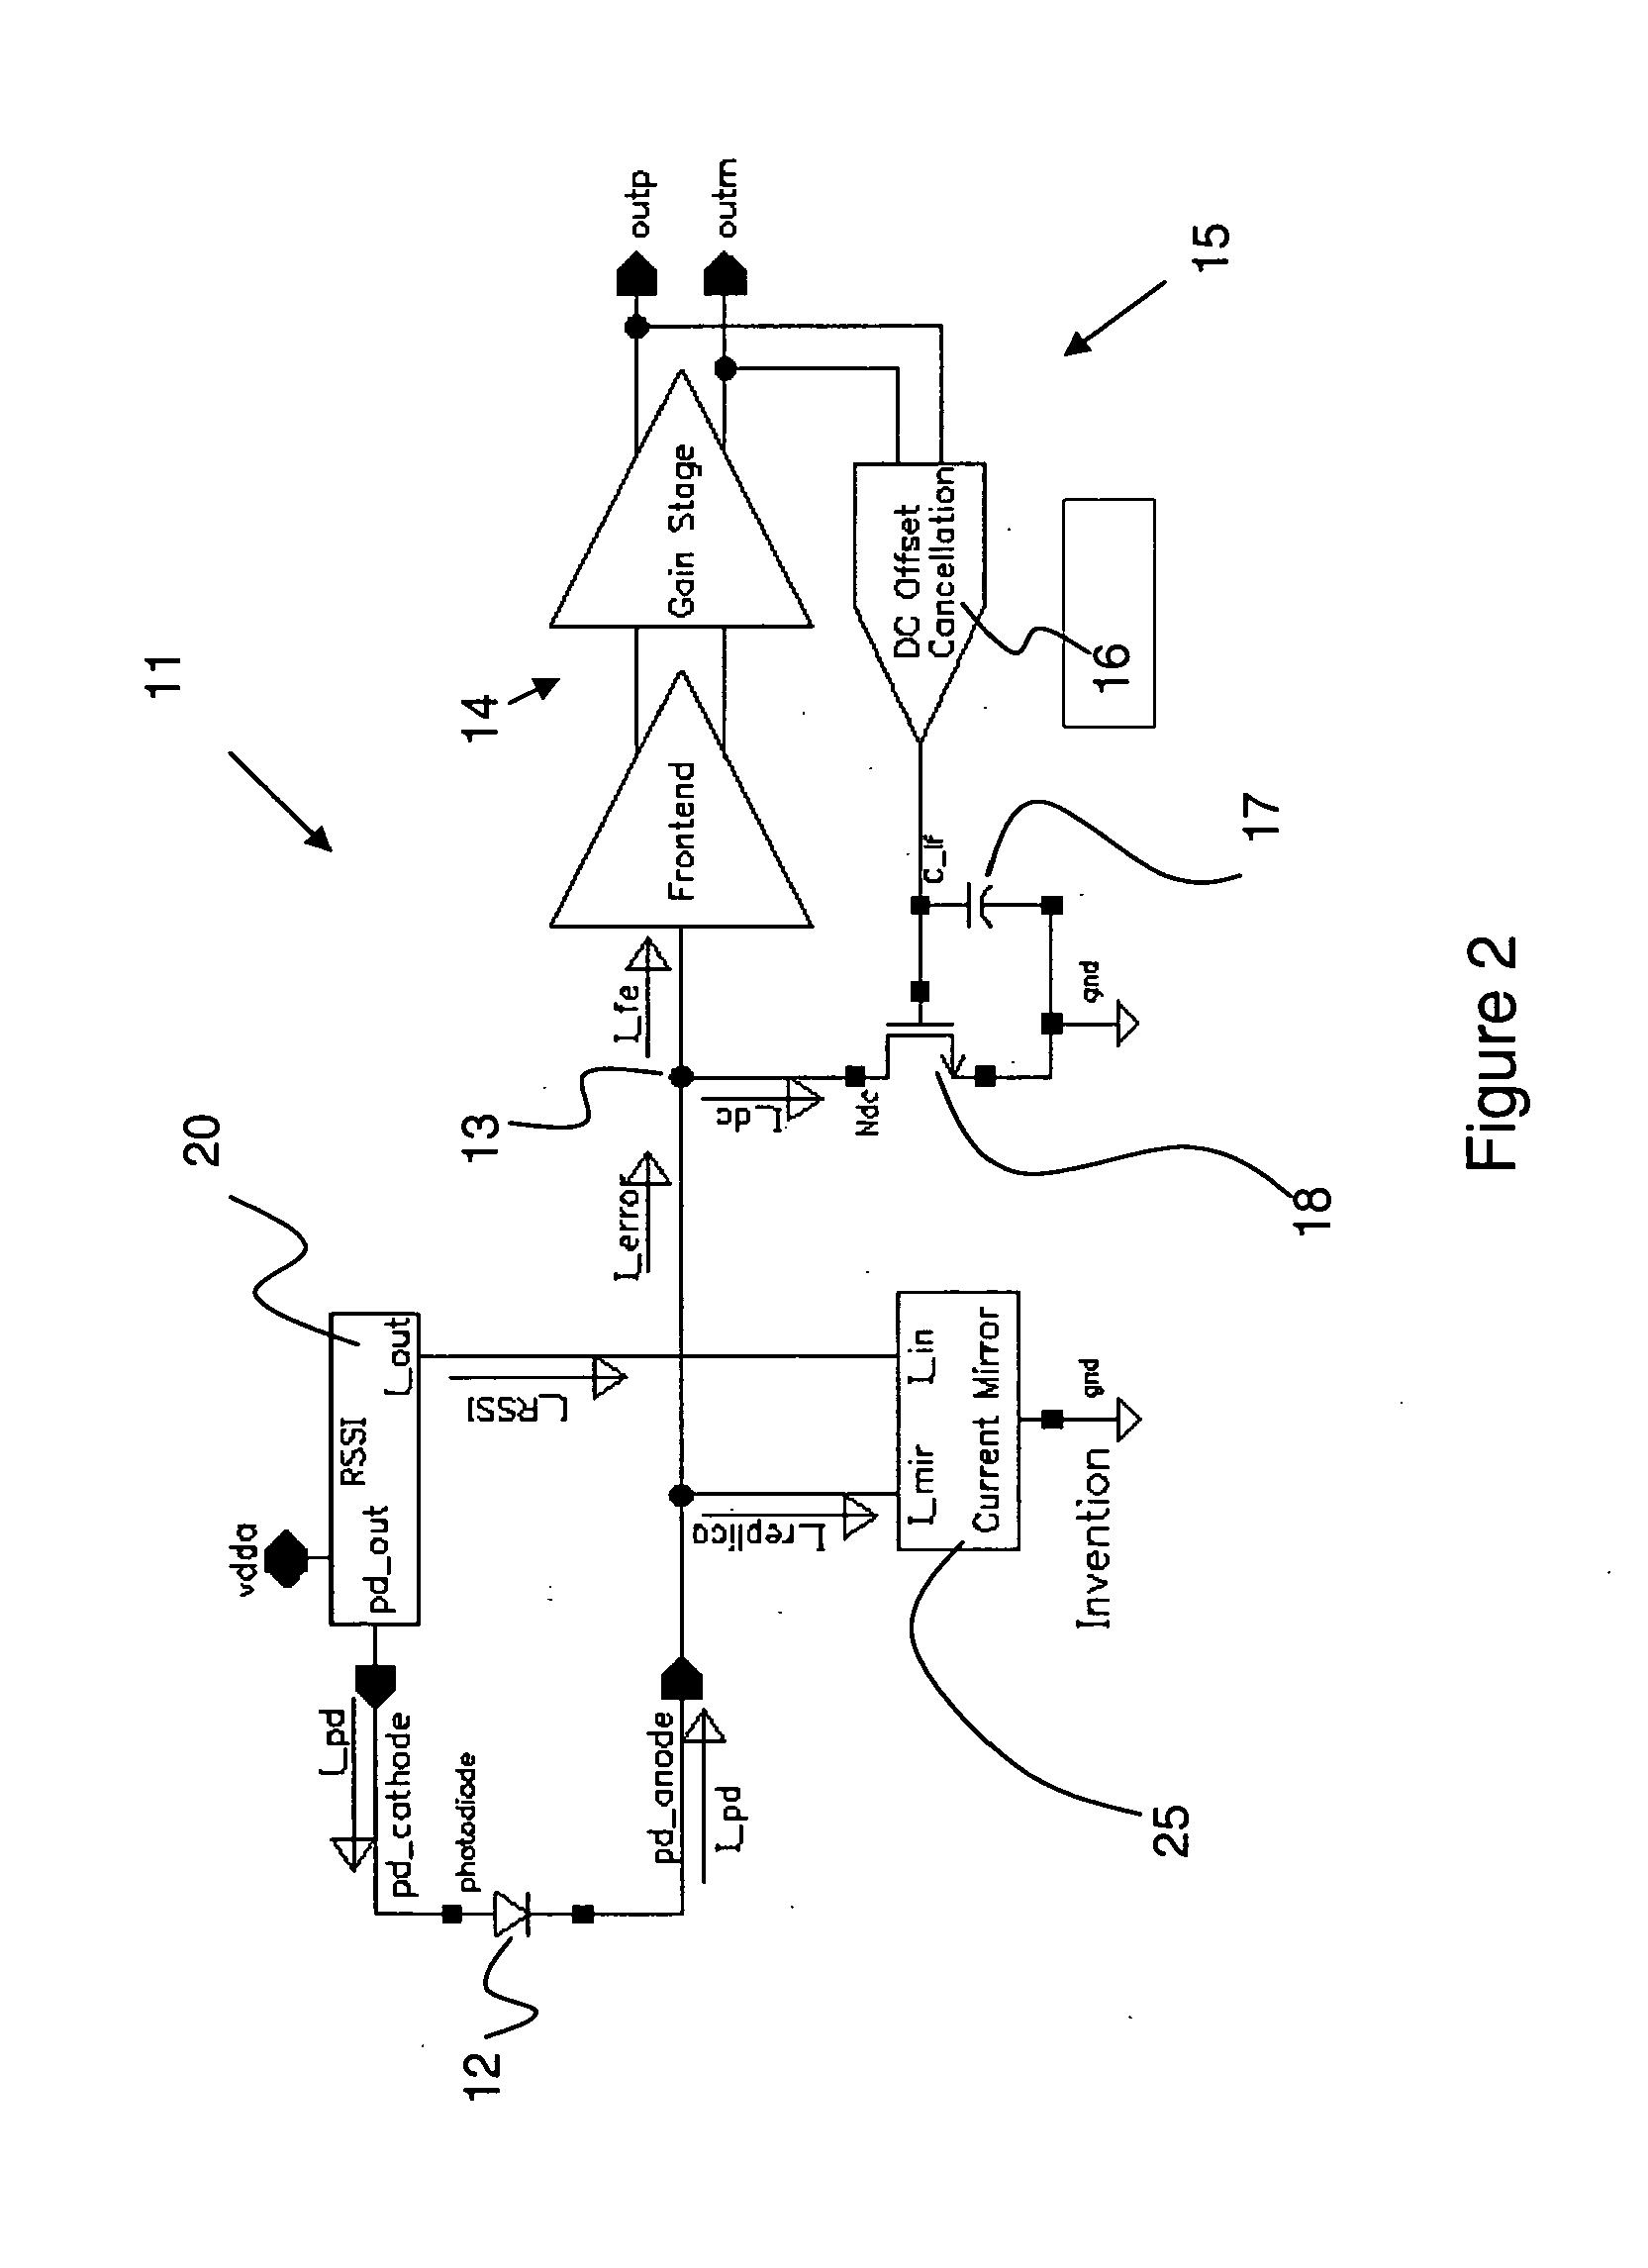 patent ep1881600a2